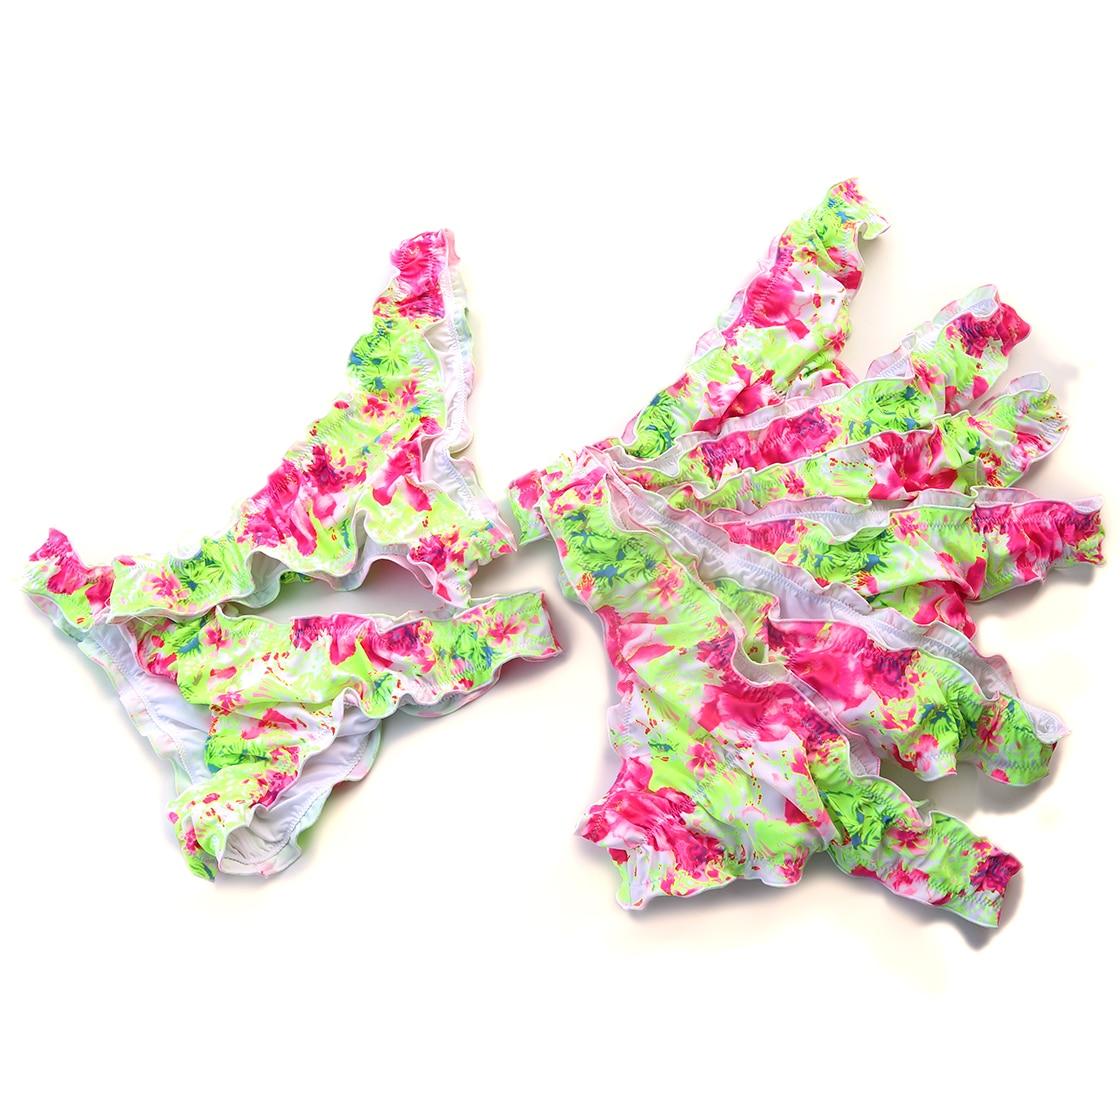 Bikini Bottoms Sexy Secret Cheeky Printing yellow Swimwear Biquini  Bikinis Swim Suit Women Brazilian Bikini Thong Bottom